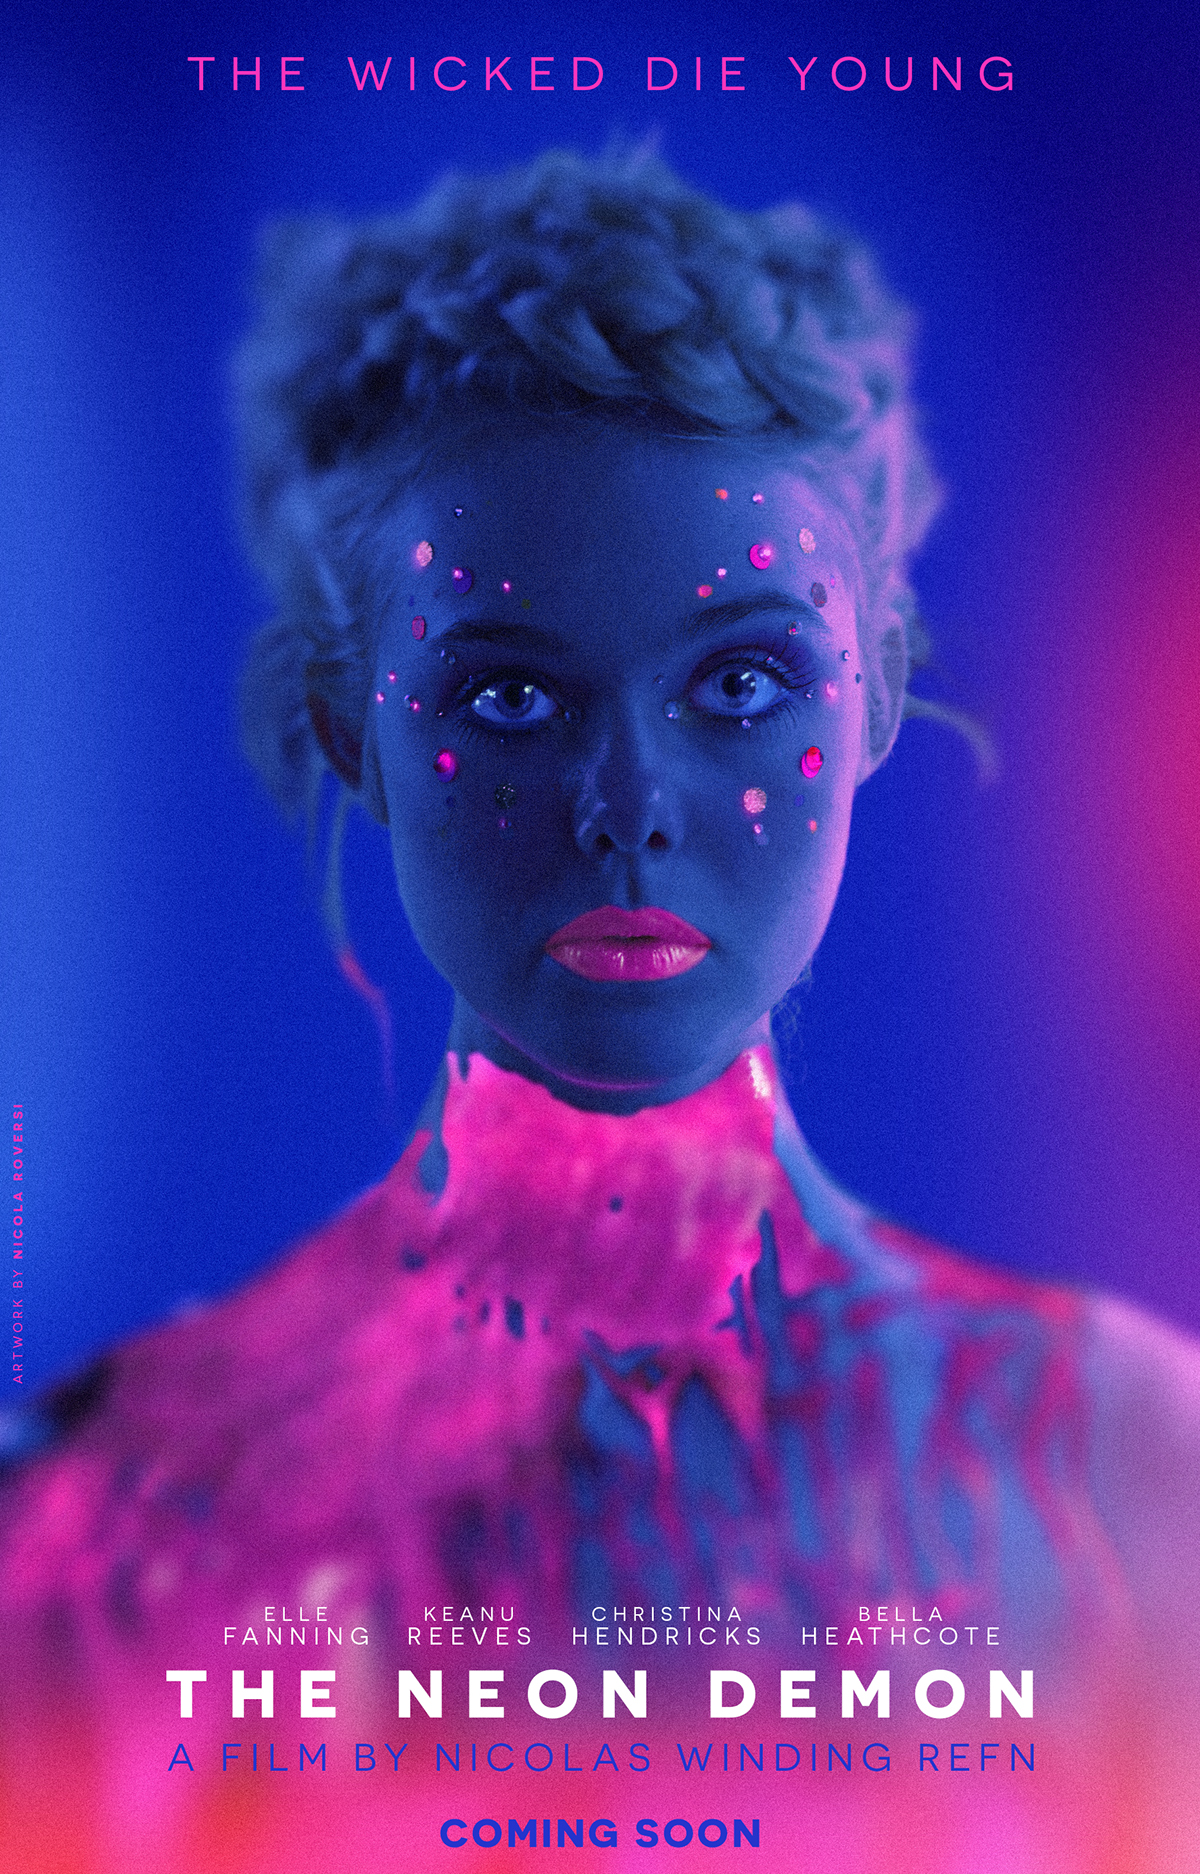 The Neon Demon on Behance